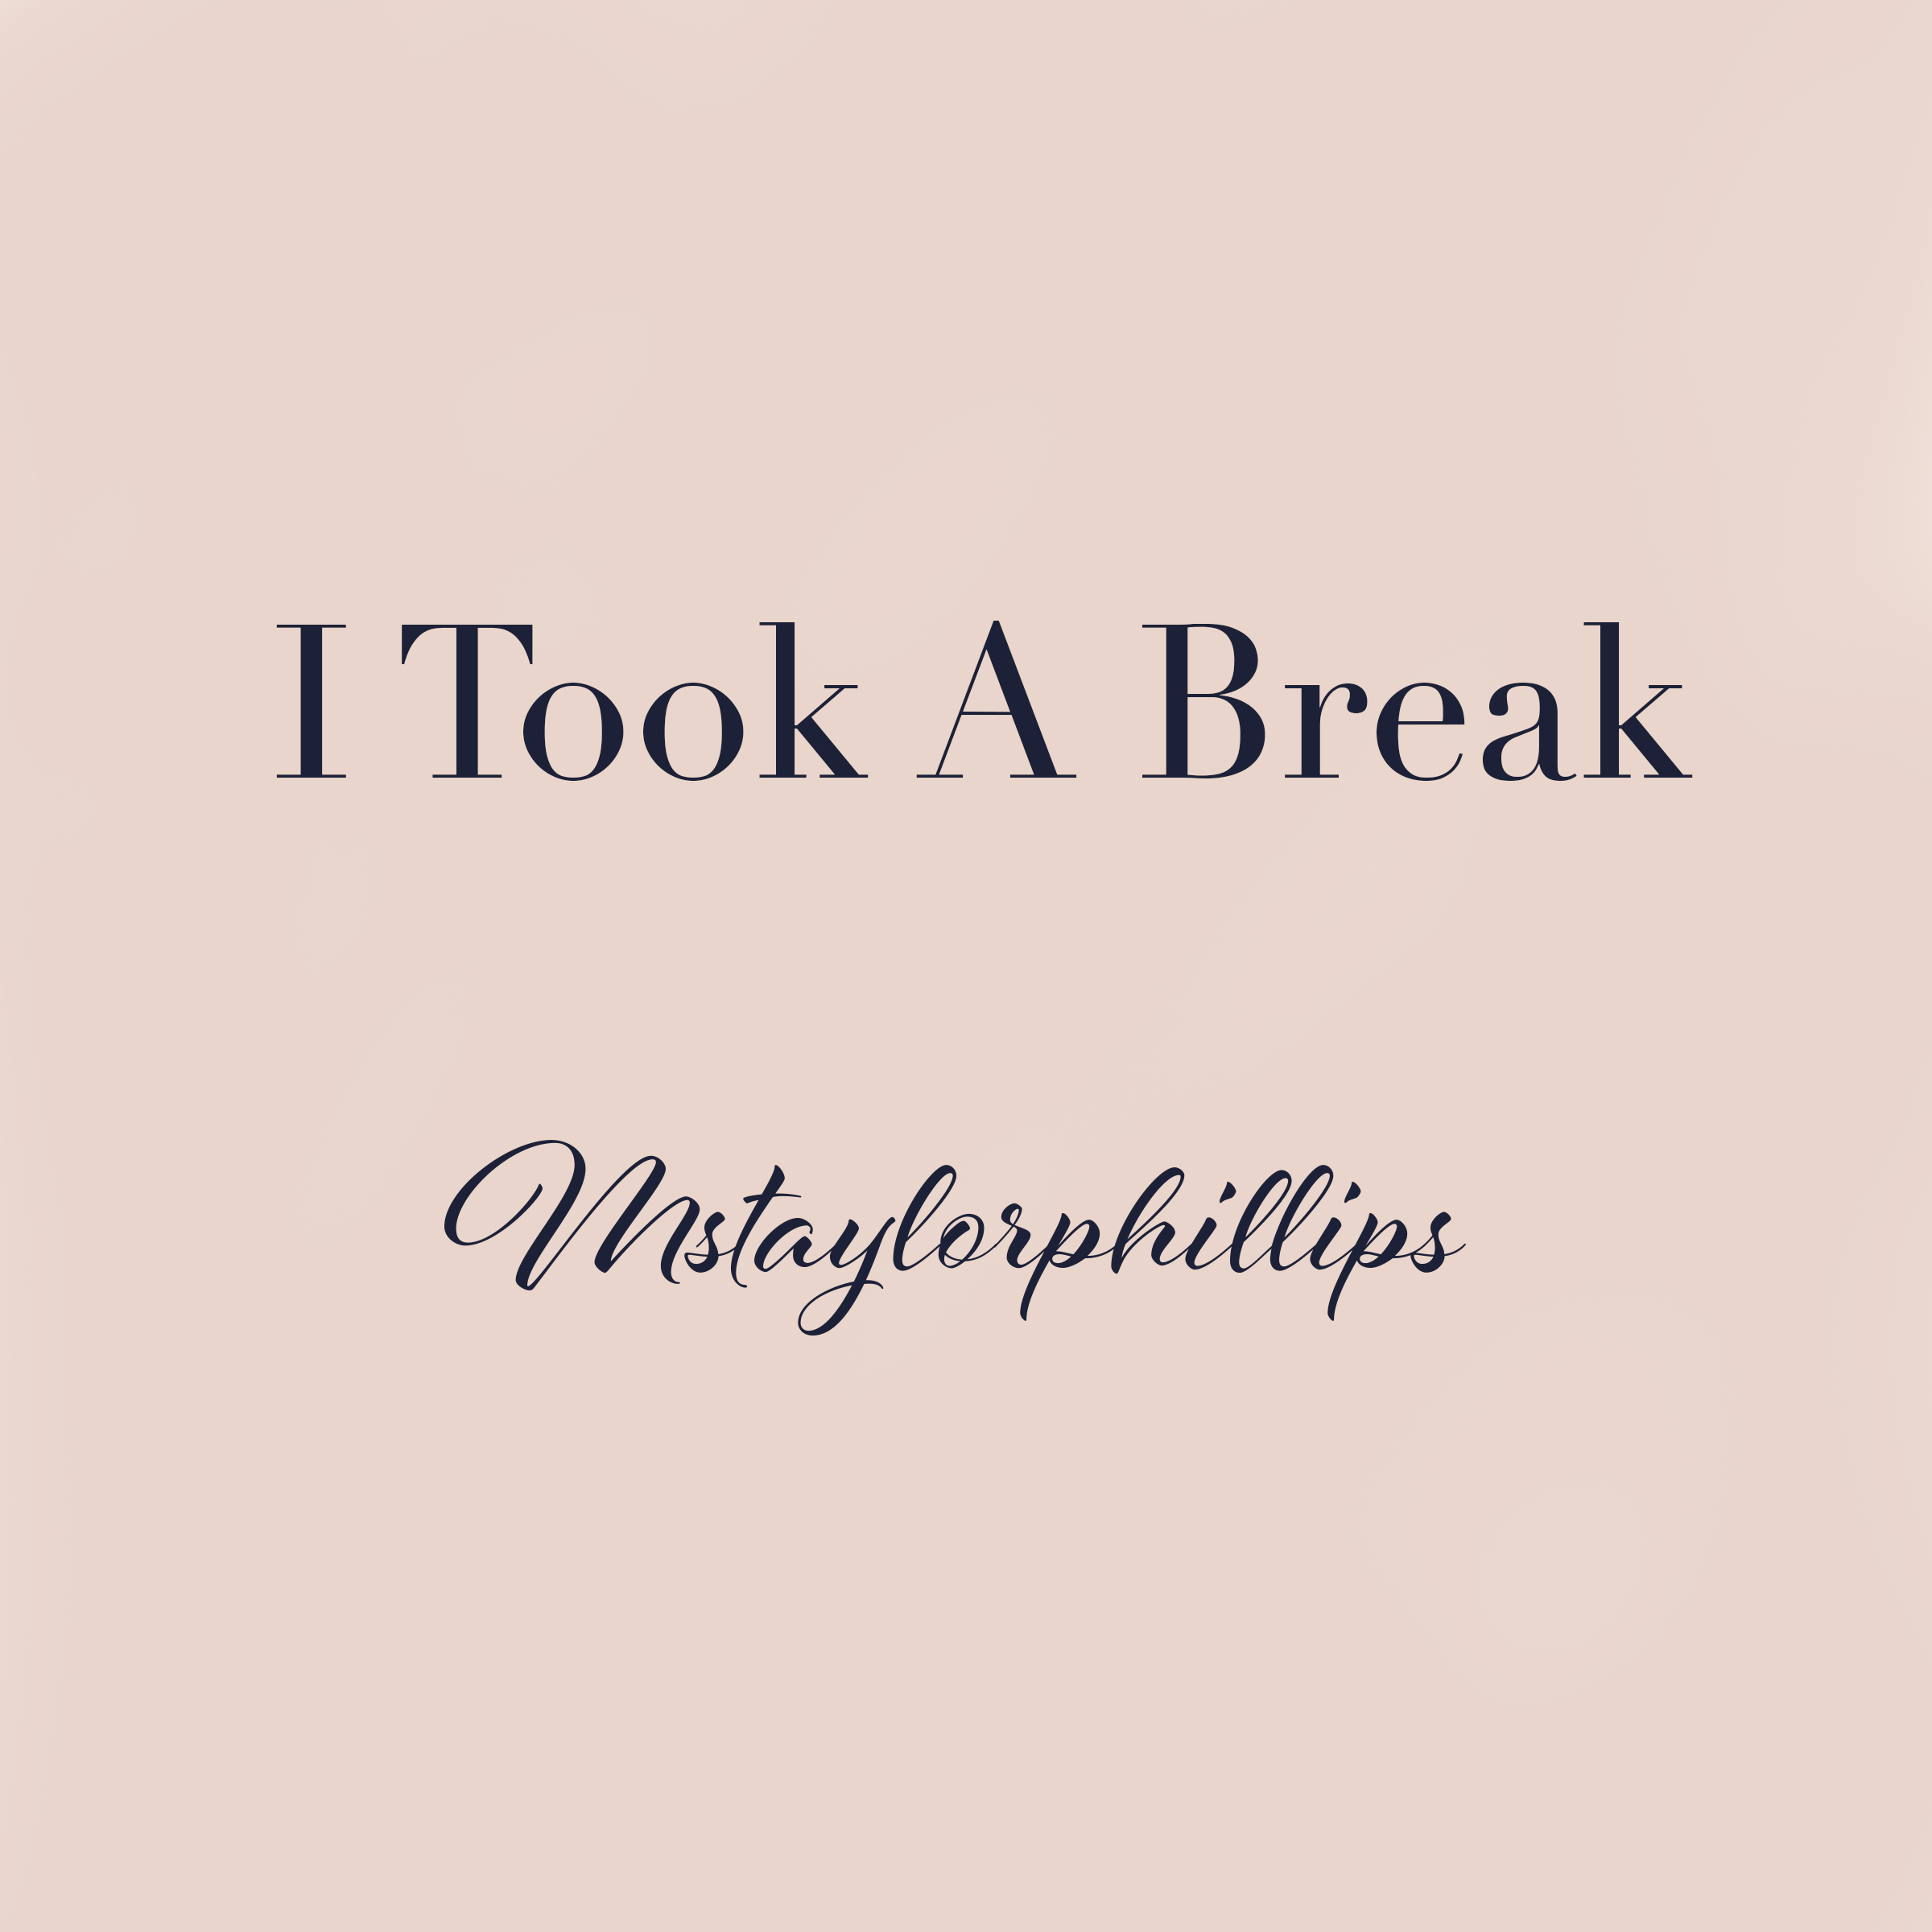 I Took A Break